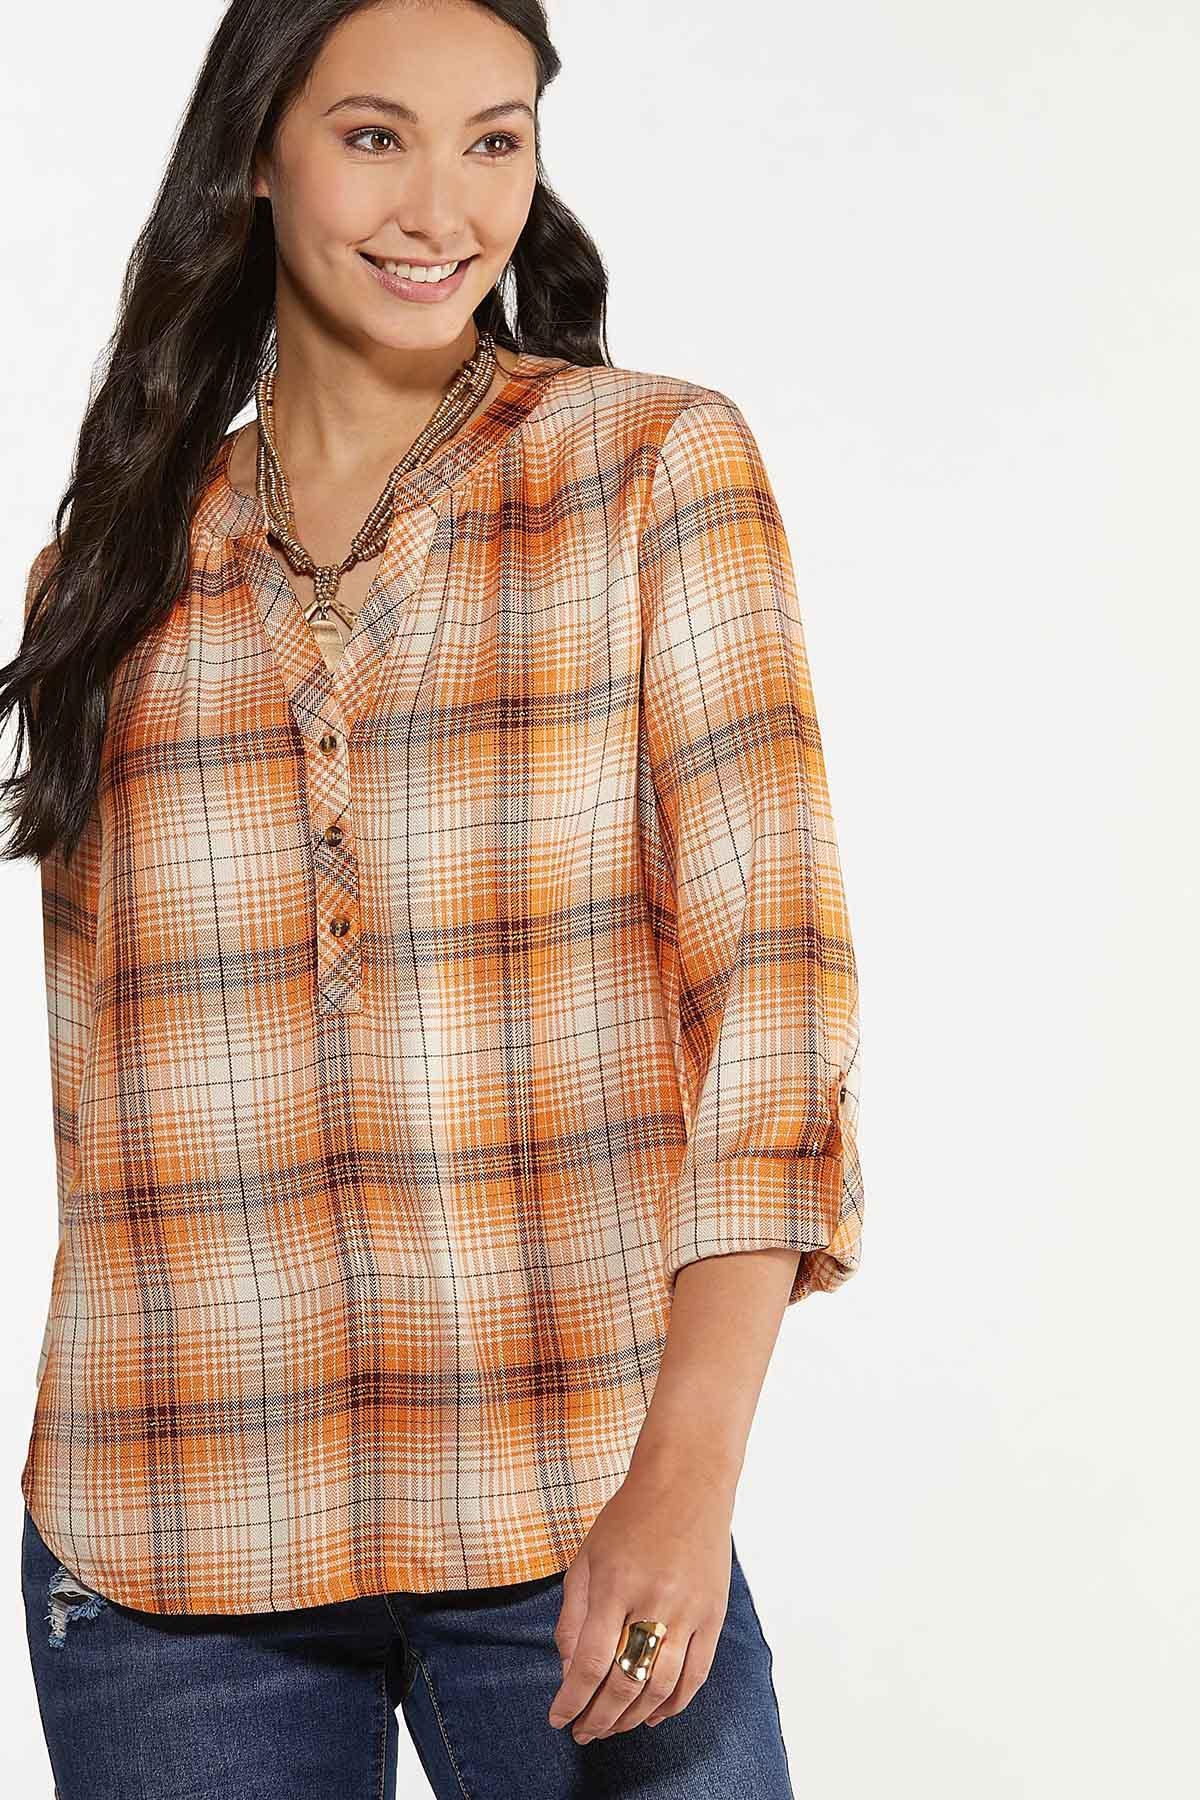 Pumpkin Plaid Pullover Top (Item #44641118)